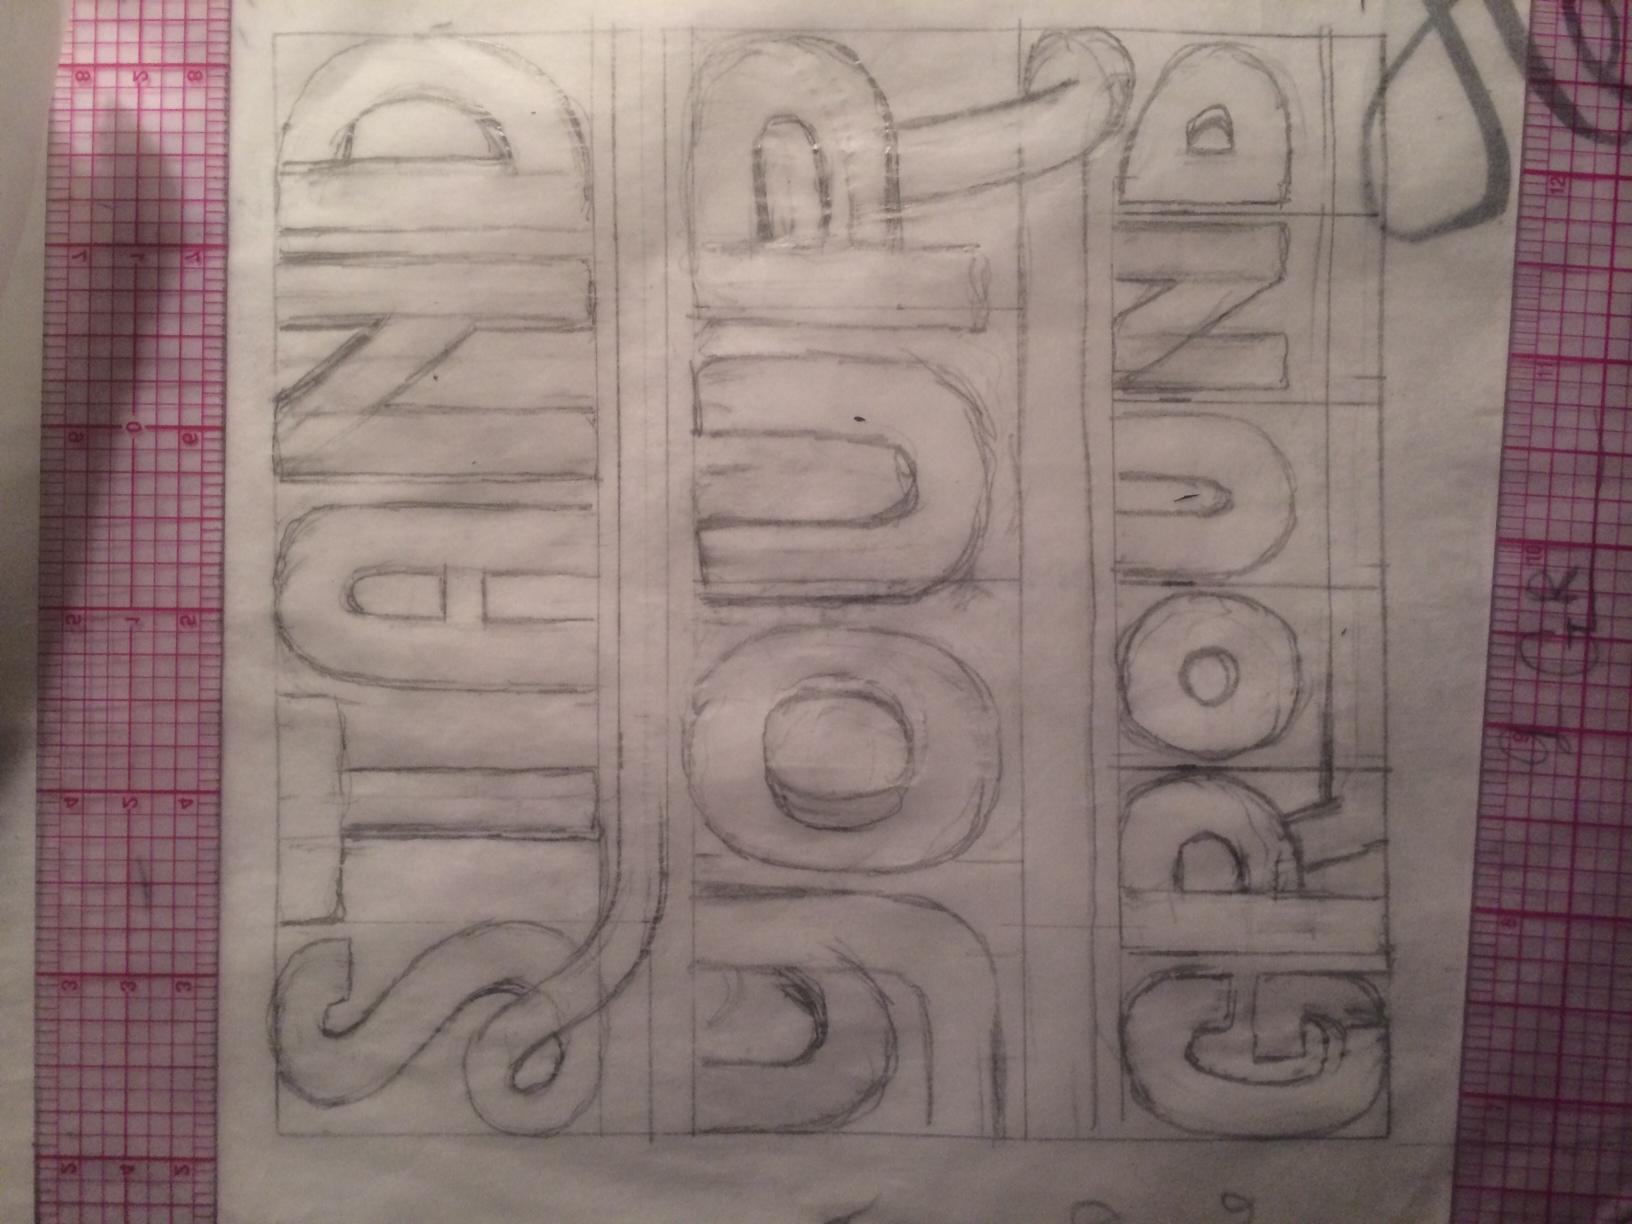 Jackson 5 / logo reinterpretation  & Tom Petty - Stand Your Ground    - image 9 - student project